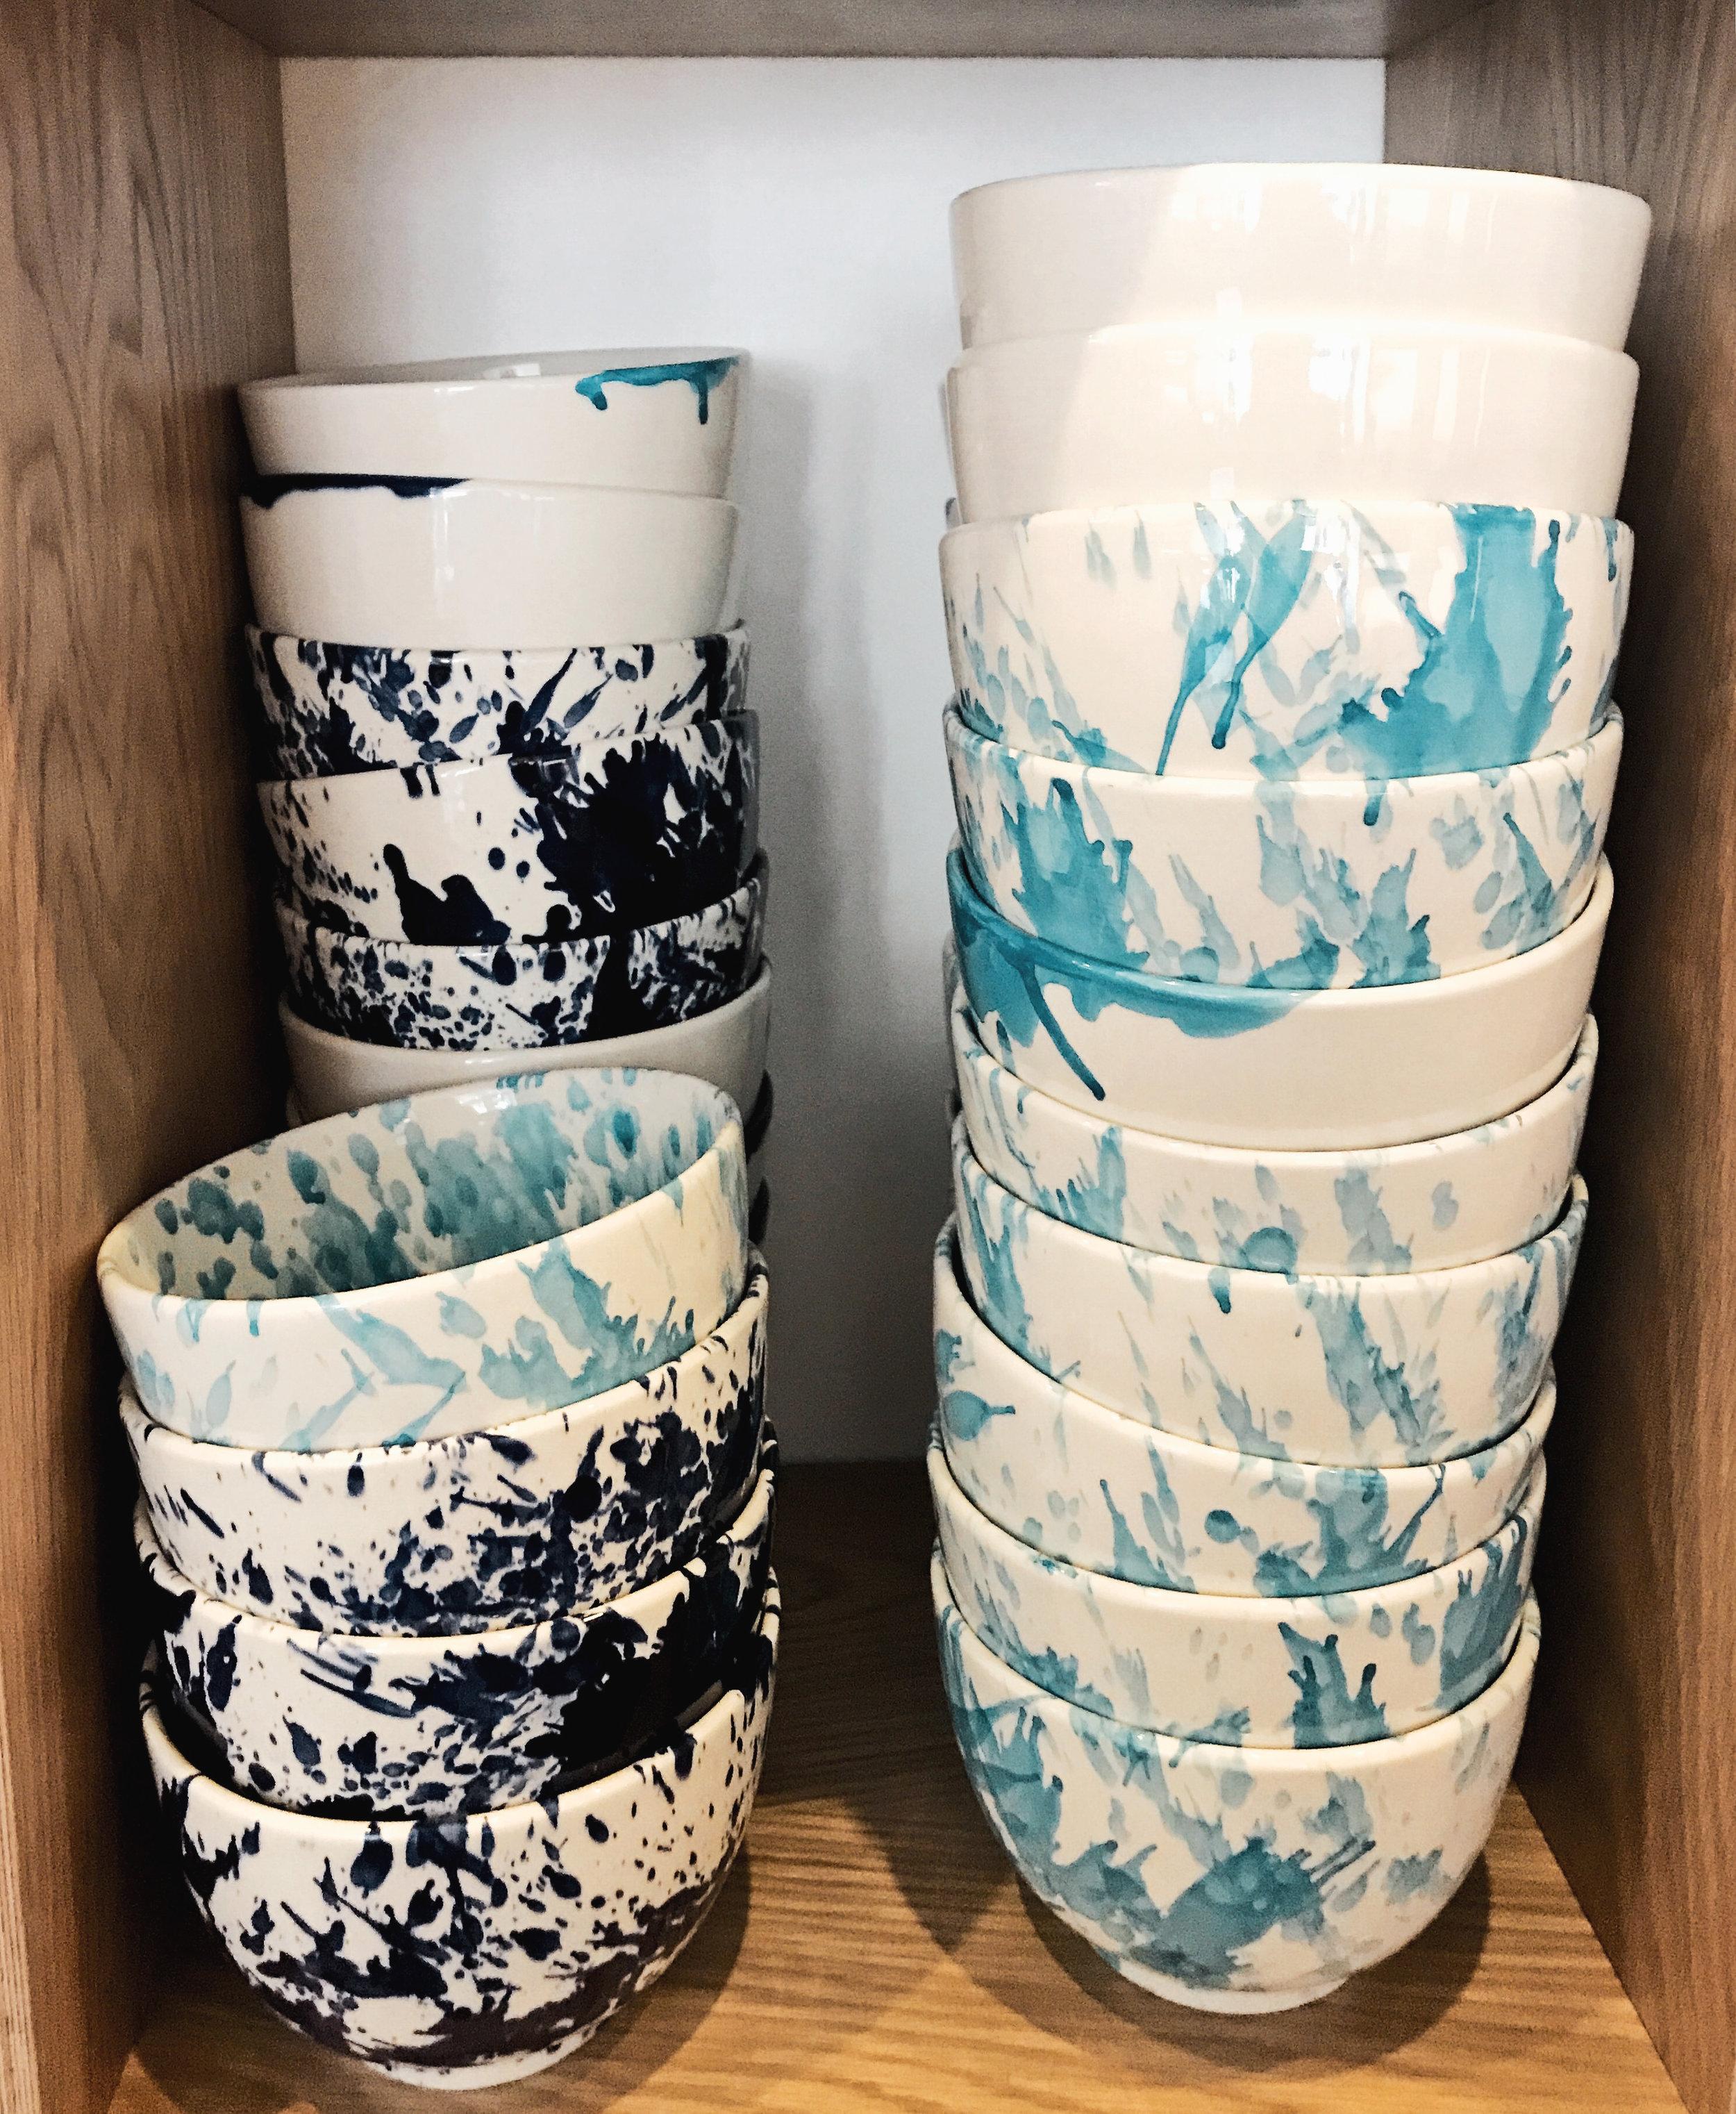 Ceramics at The Mill